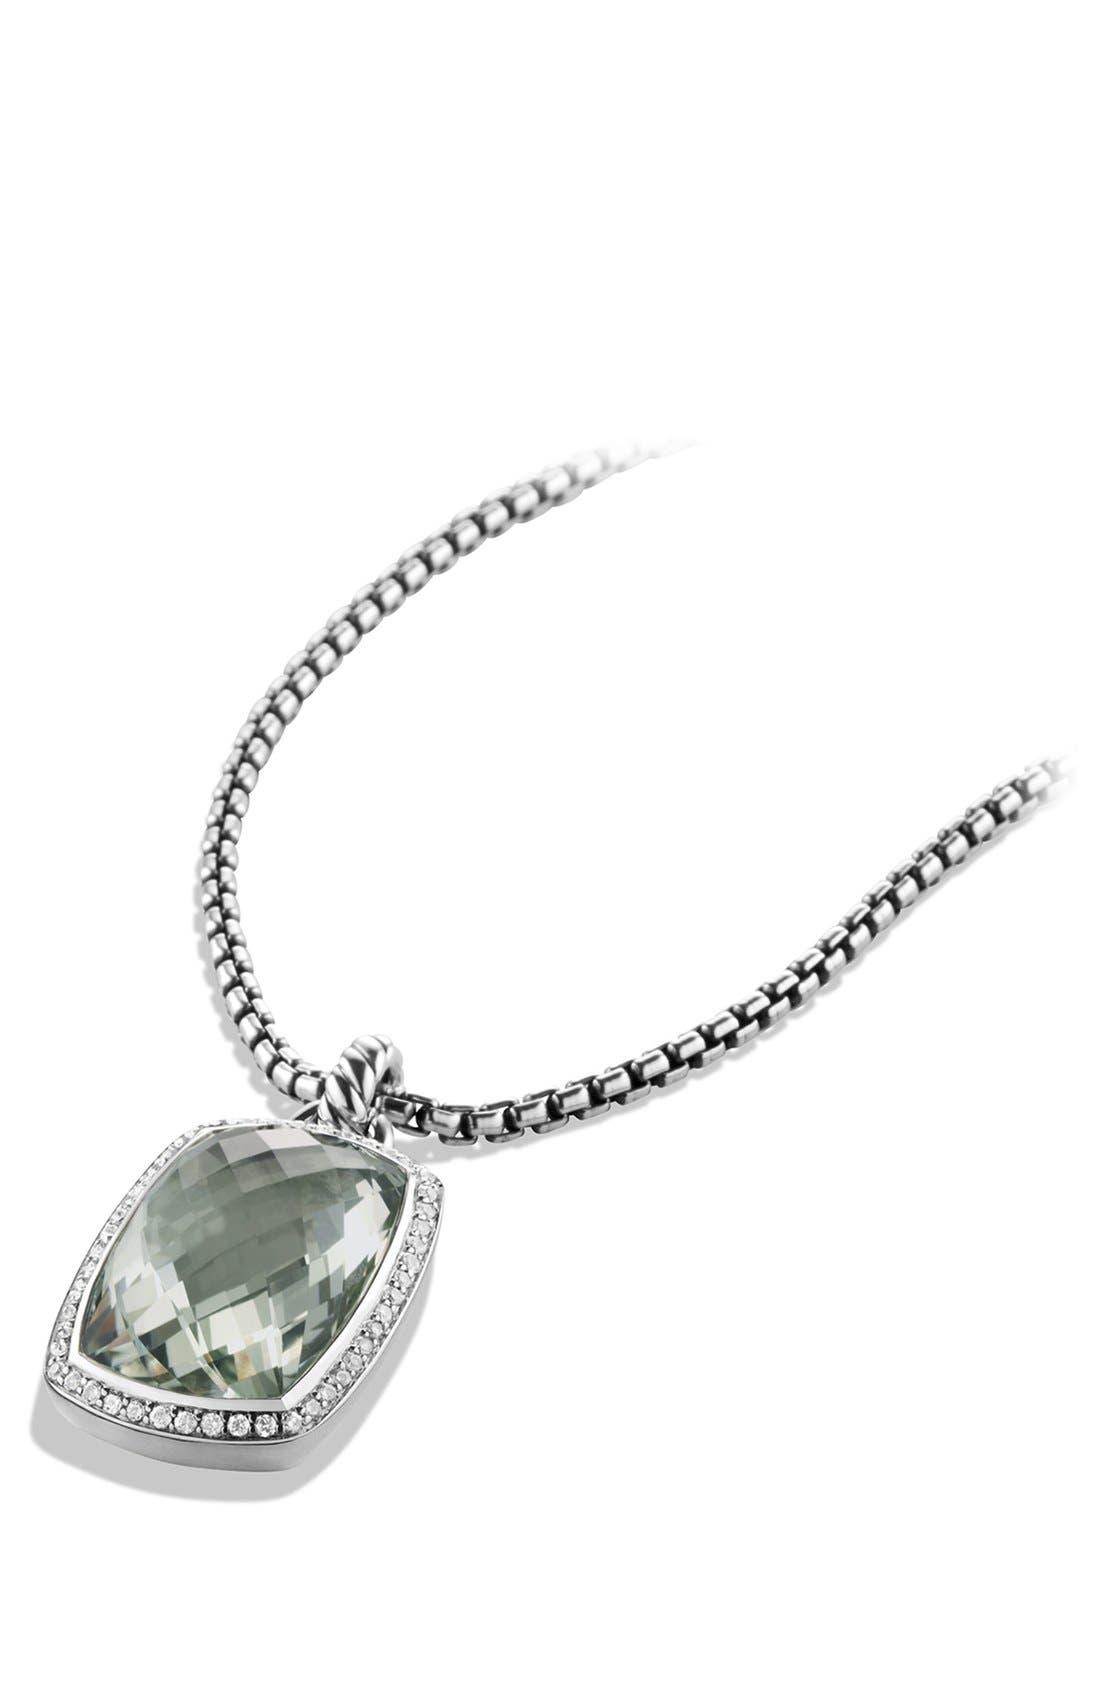 'Albion' Pendant with Semiprecious Stone and Diamonds,                             Alternate thumbnail 2, color,                             330